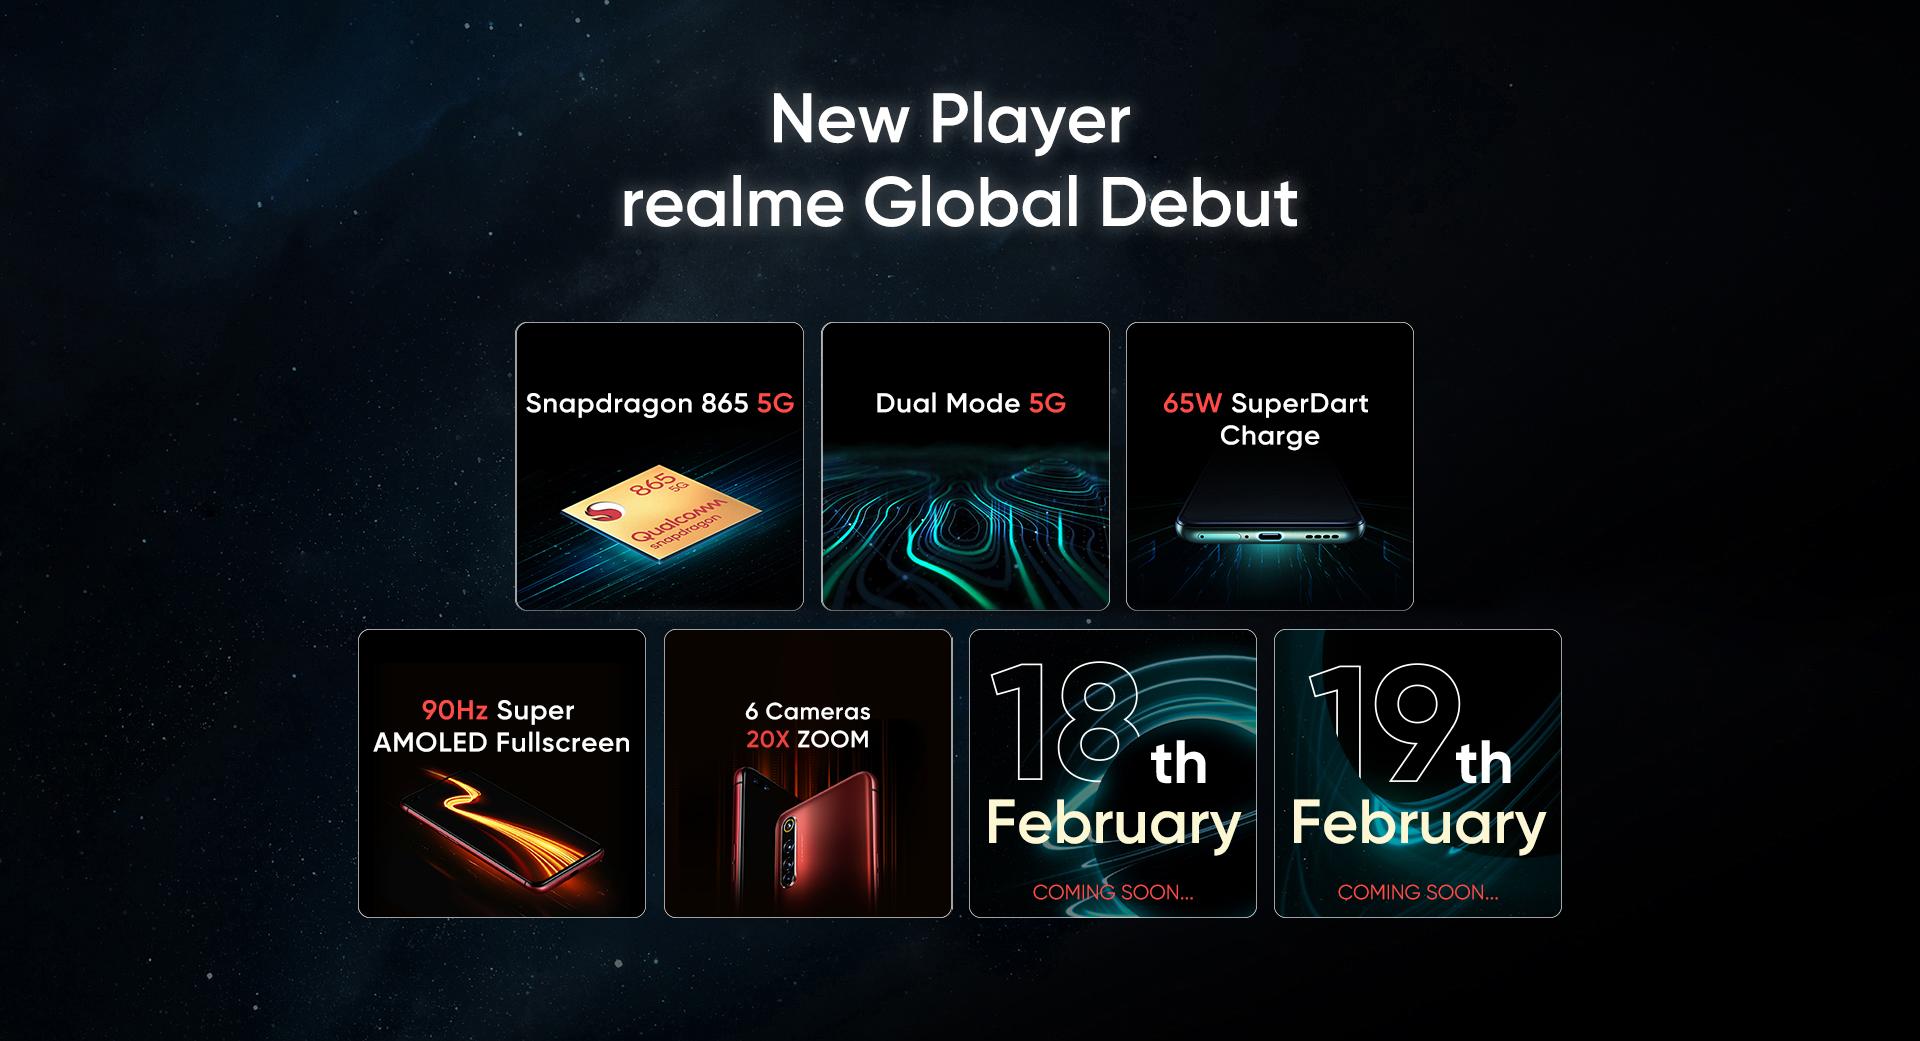 realme官方公布了5G旗舰realme真我X50 Pro的相机信息